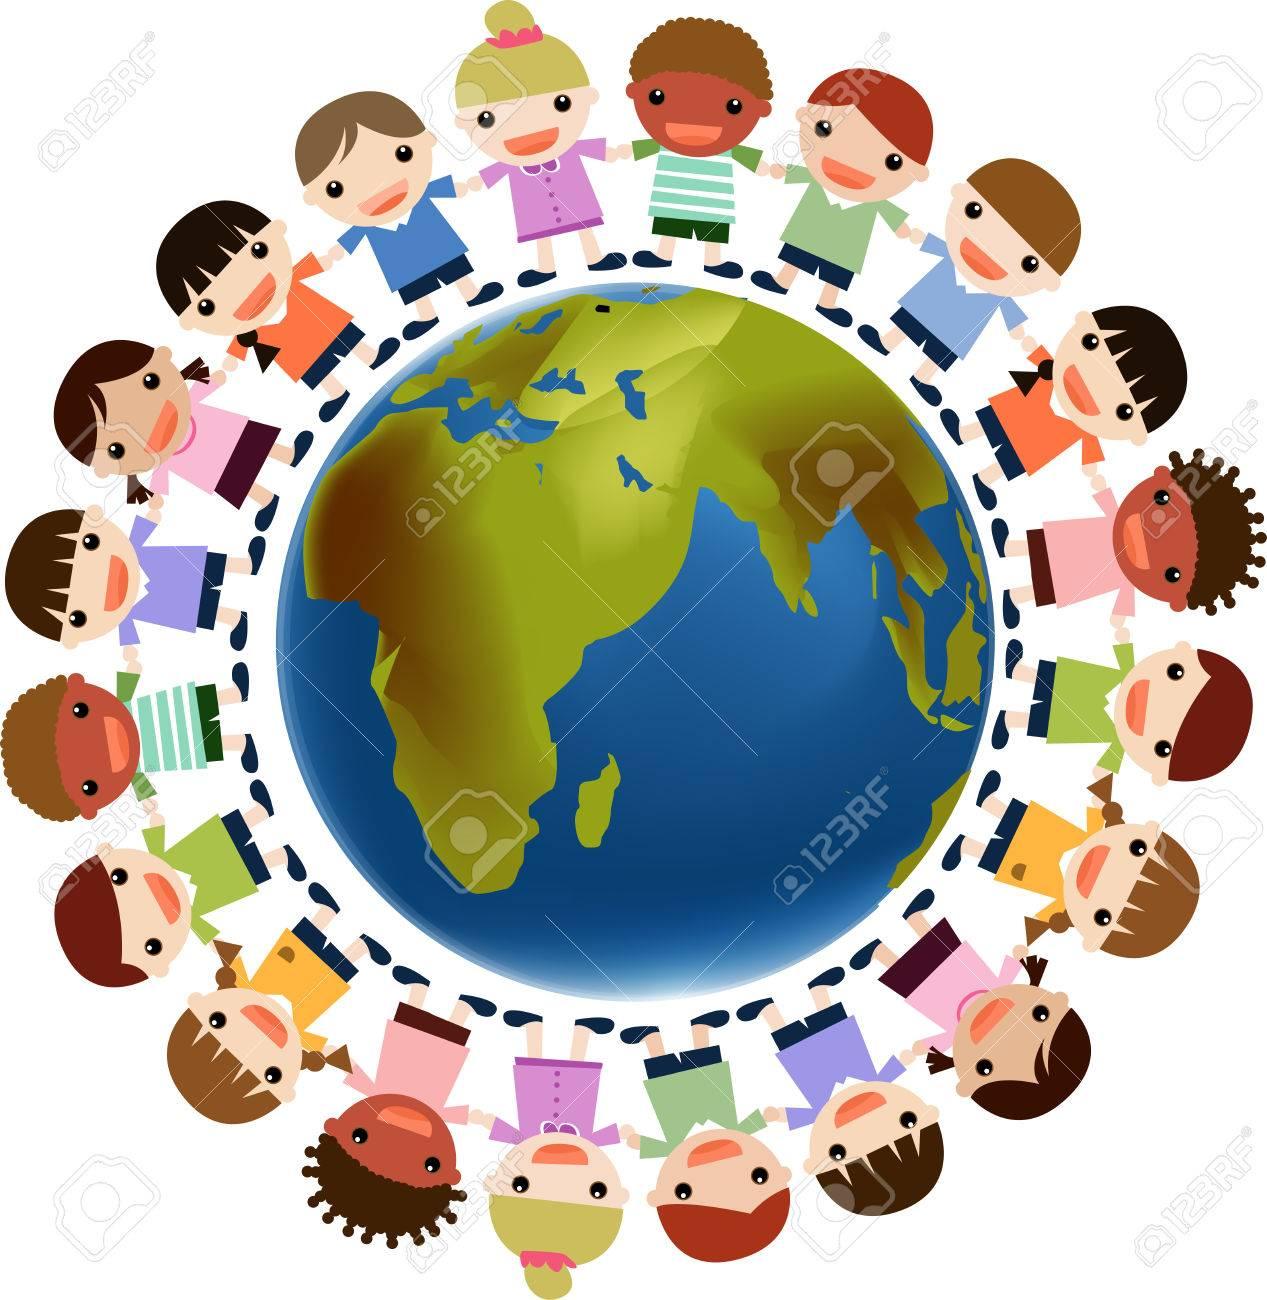 kids holding hands around the world.